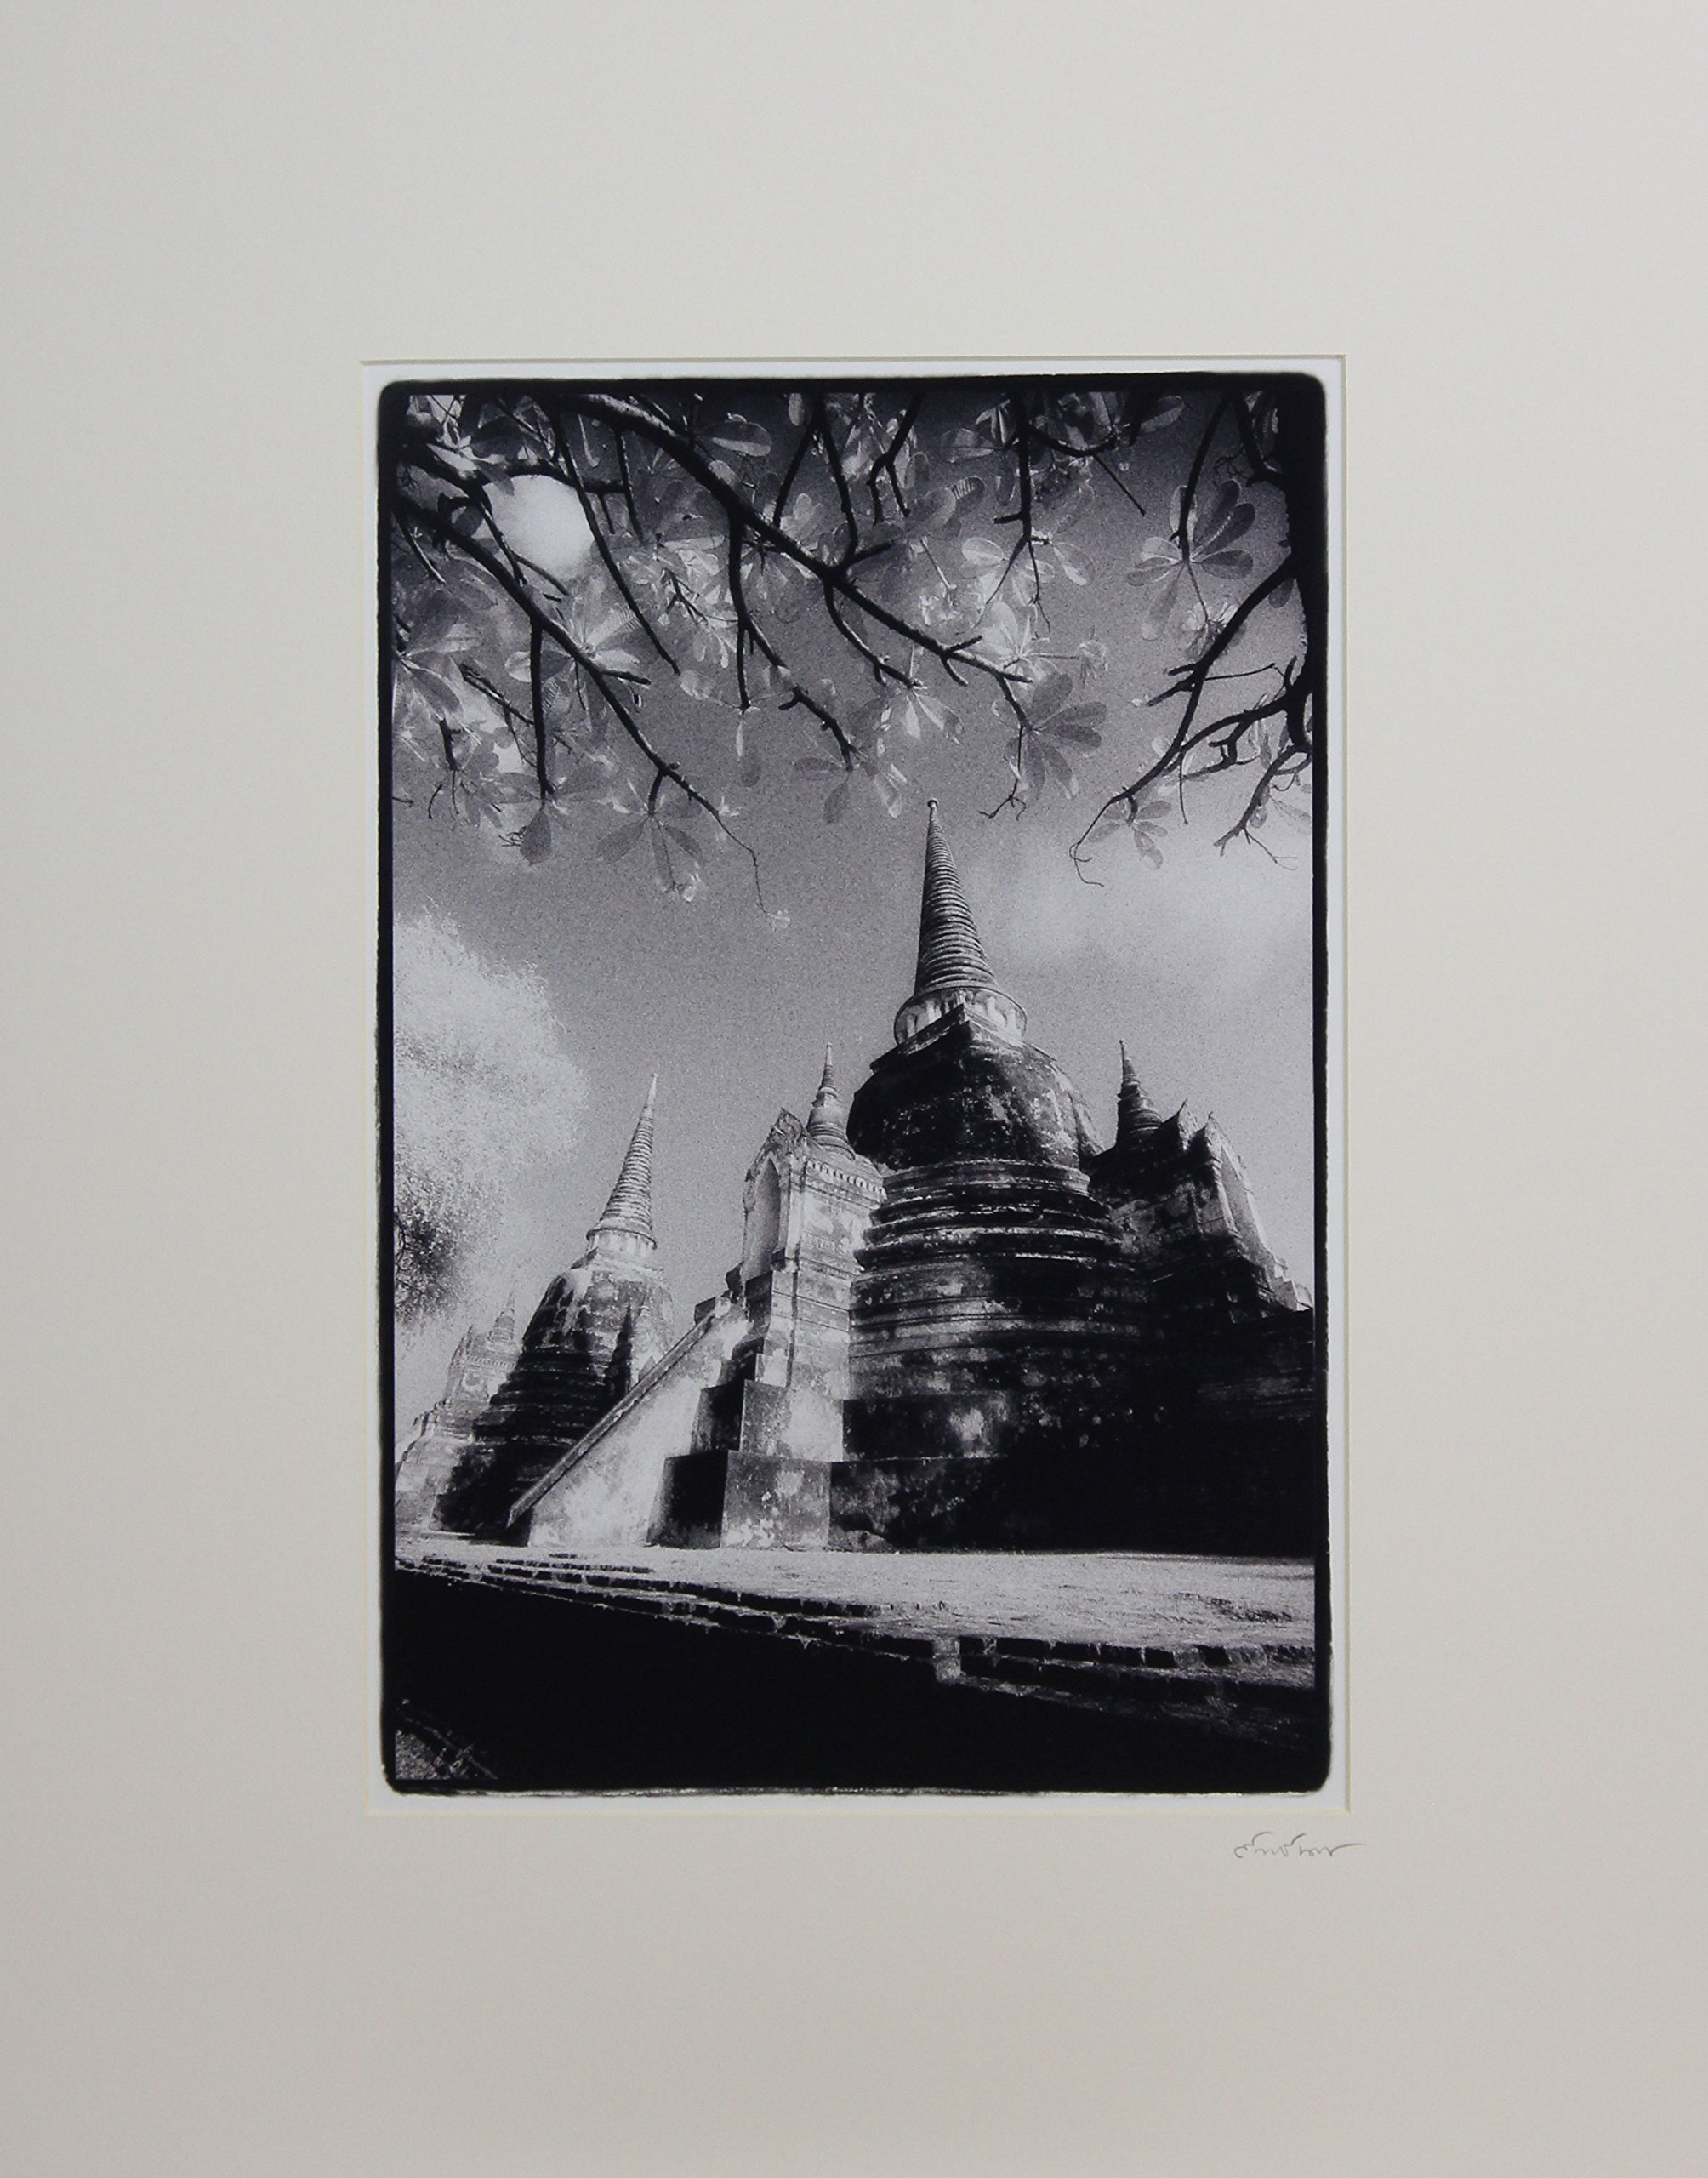 NOVICA ''Graceful Wat Phra Sri Sanphet'' Photograph by NOVICA